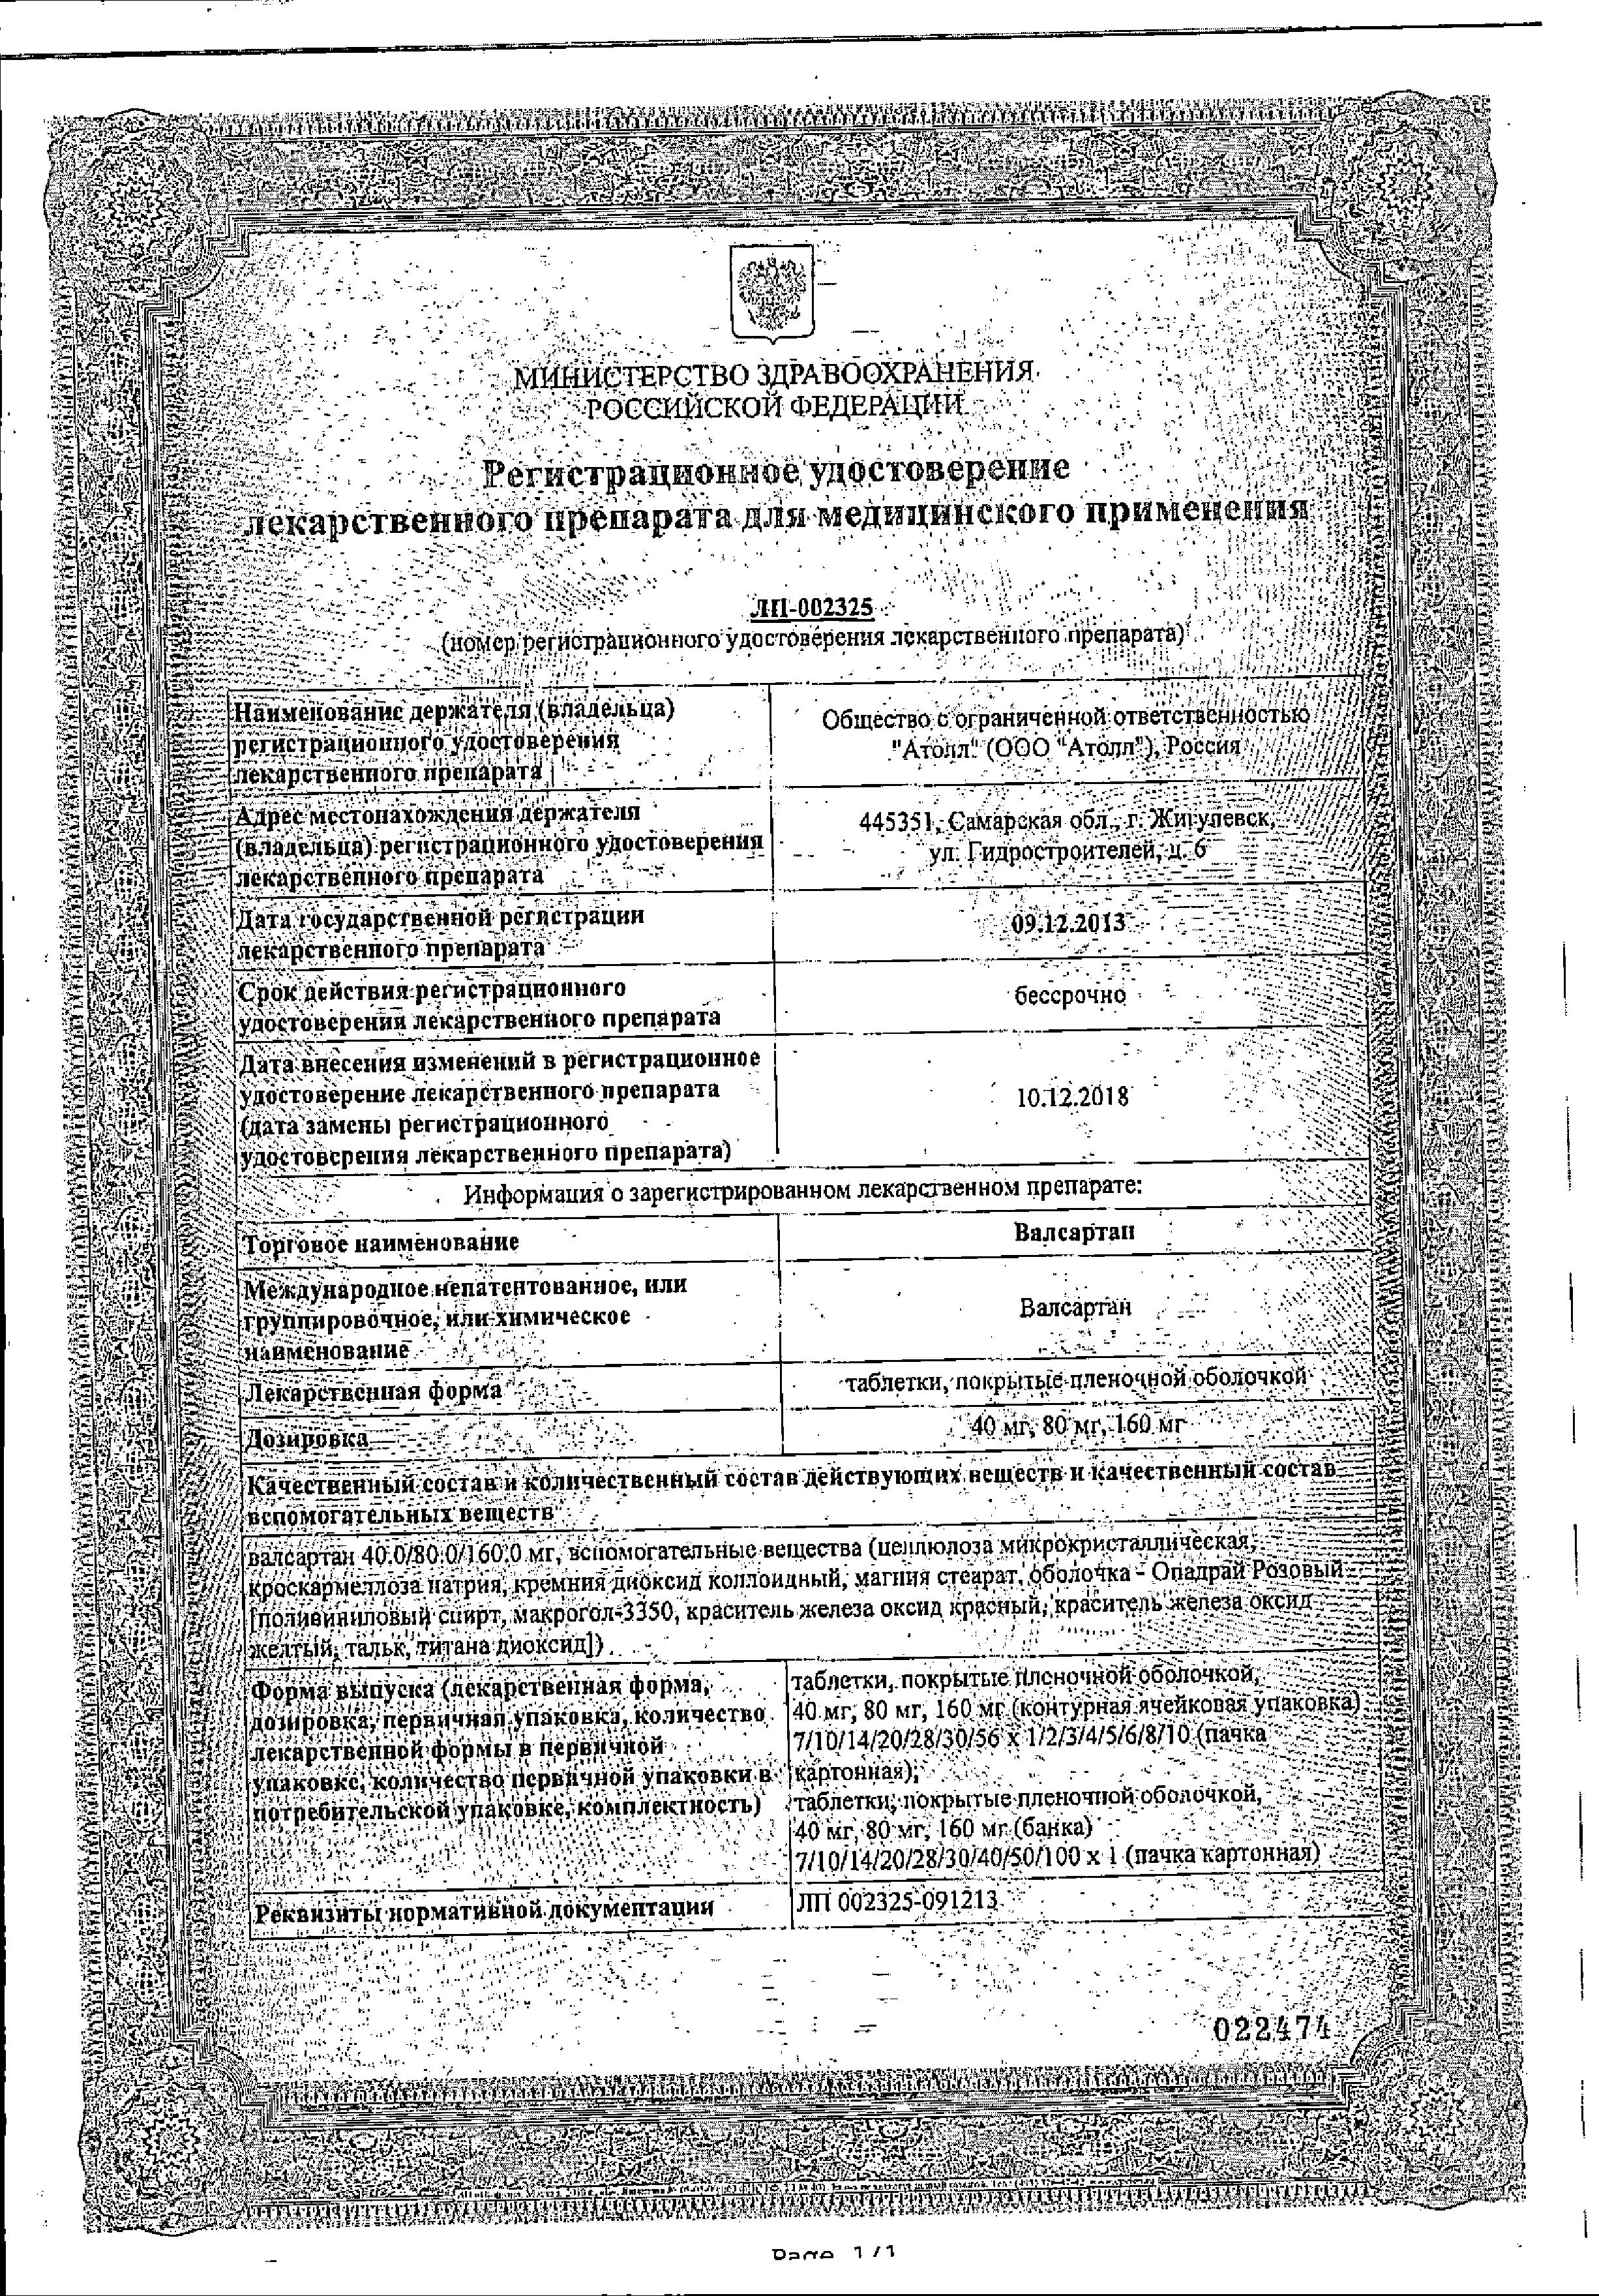 Валсартан сертификат